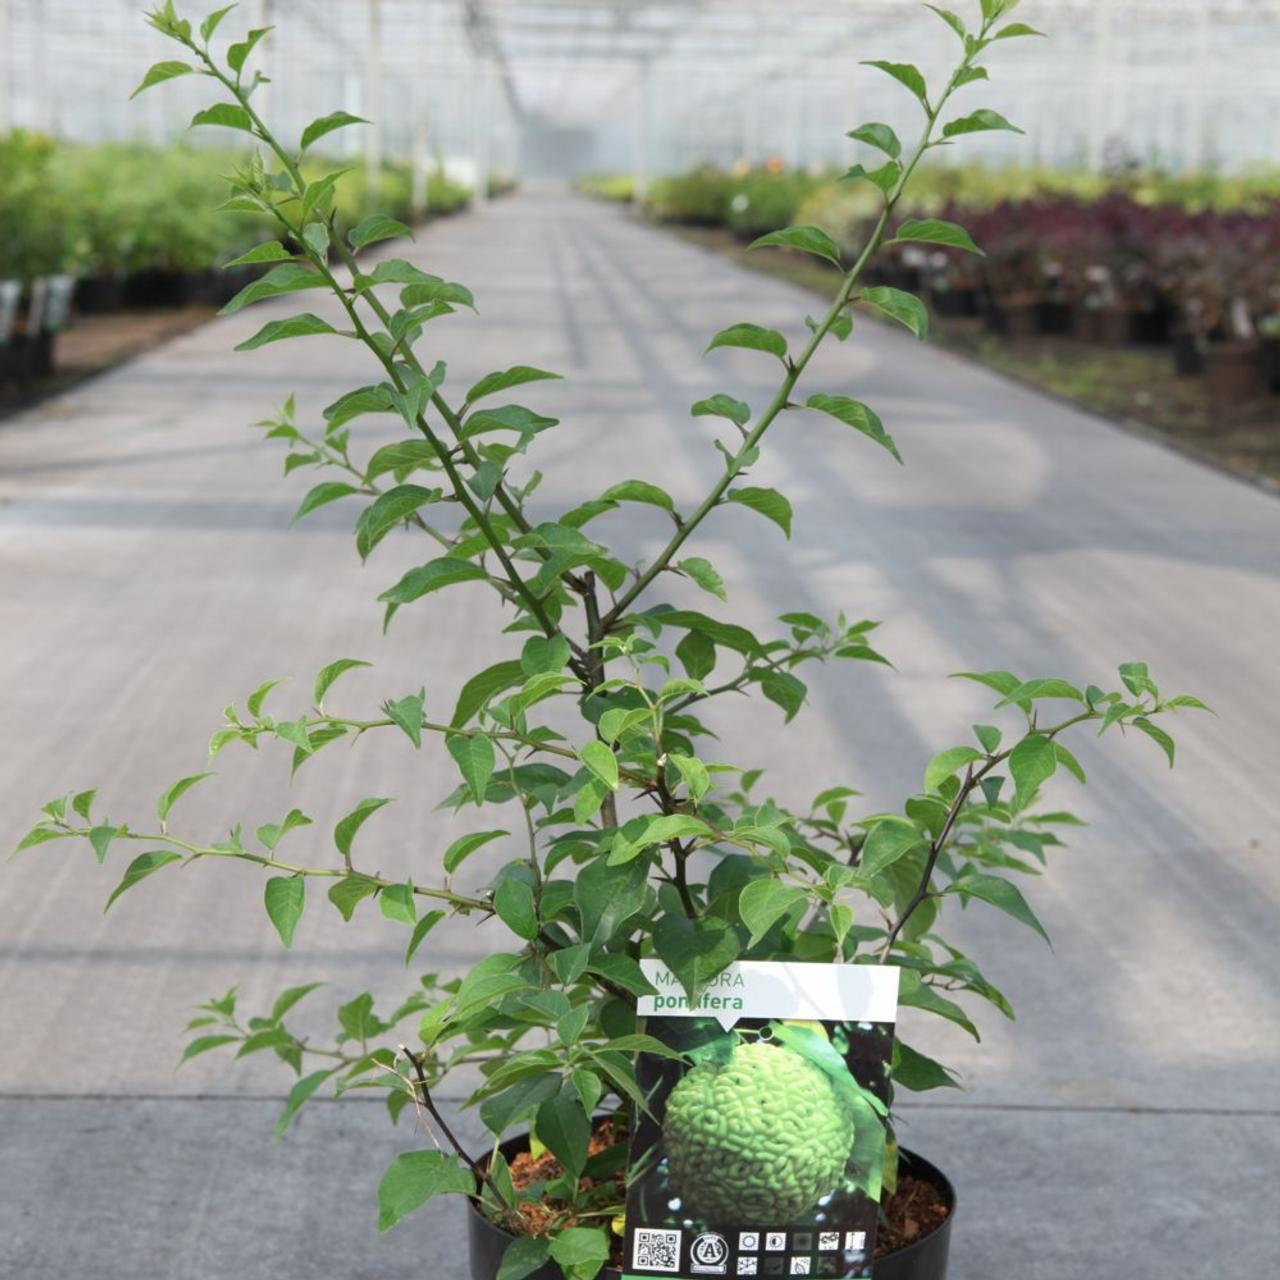 Maclura pomifera plant